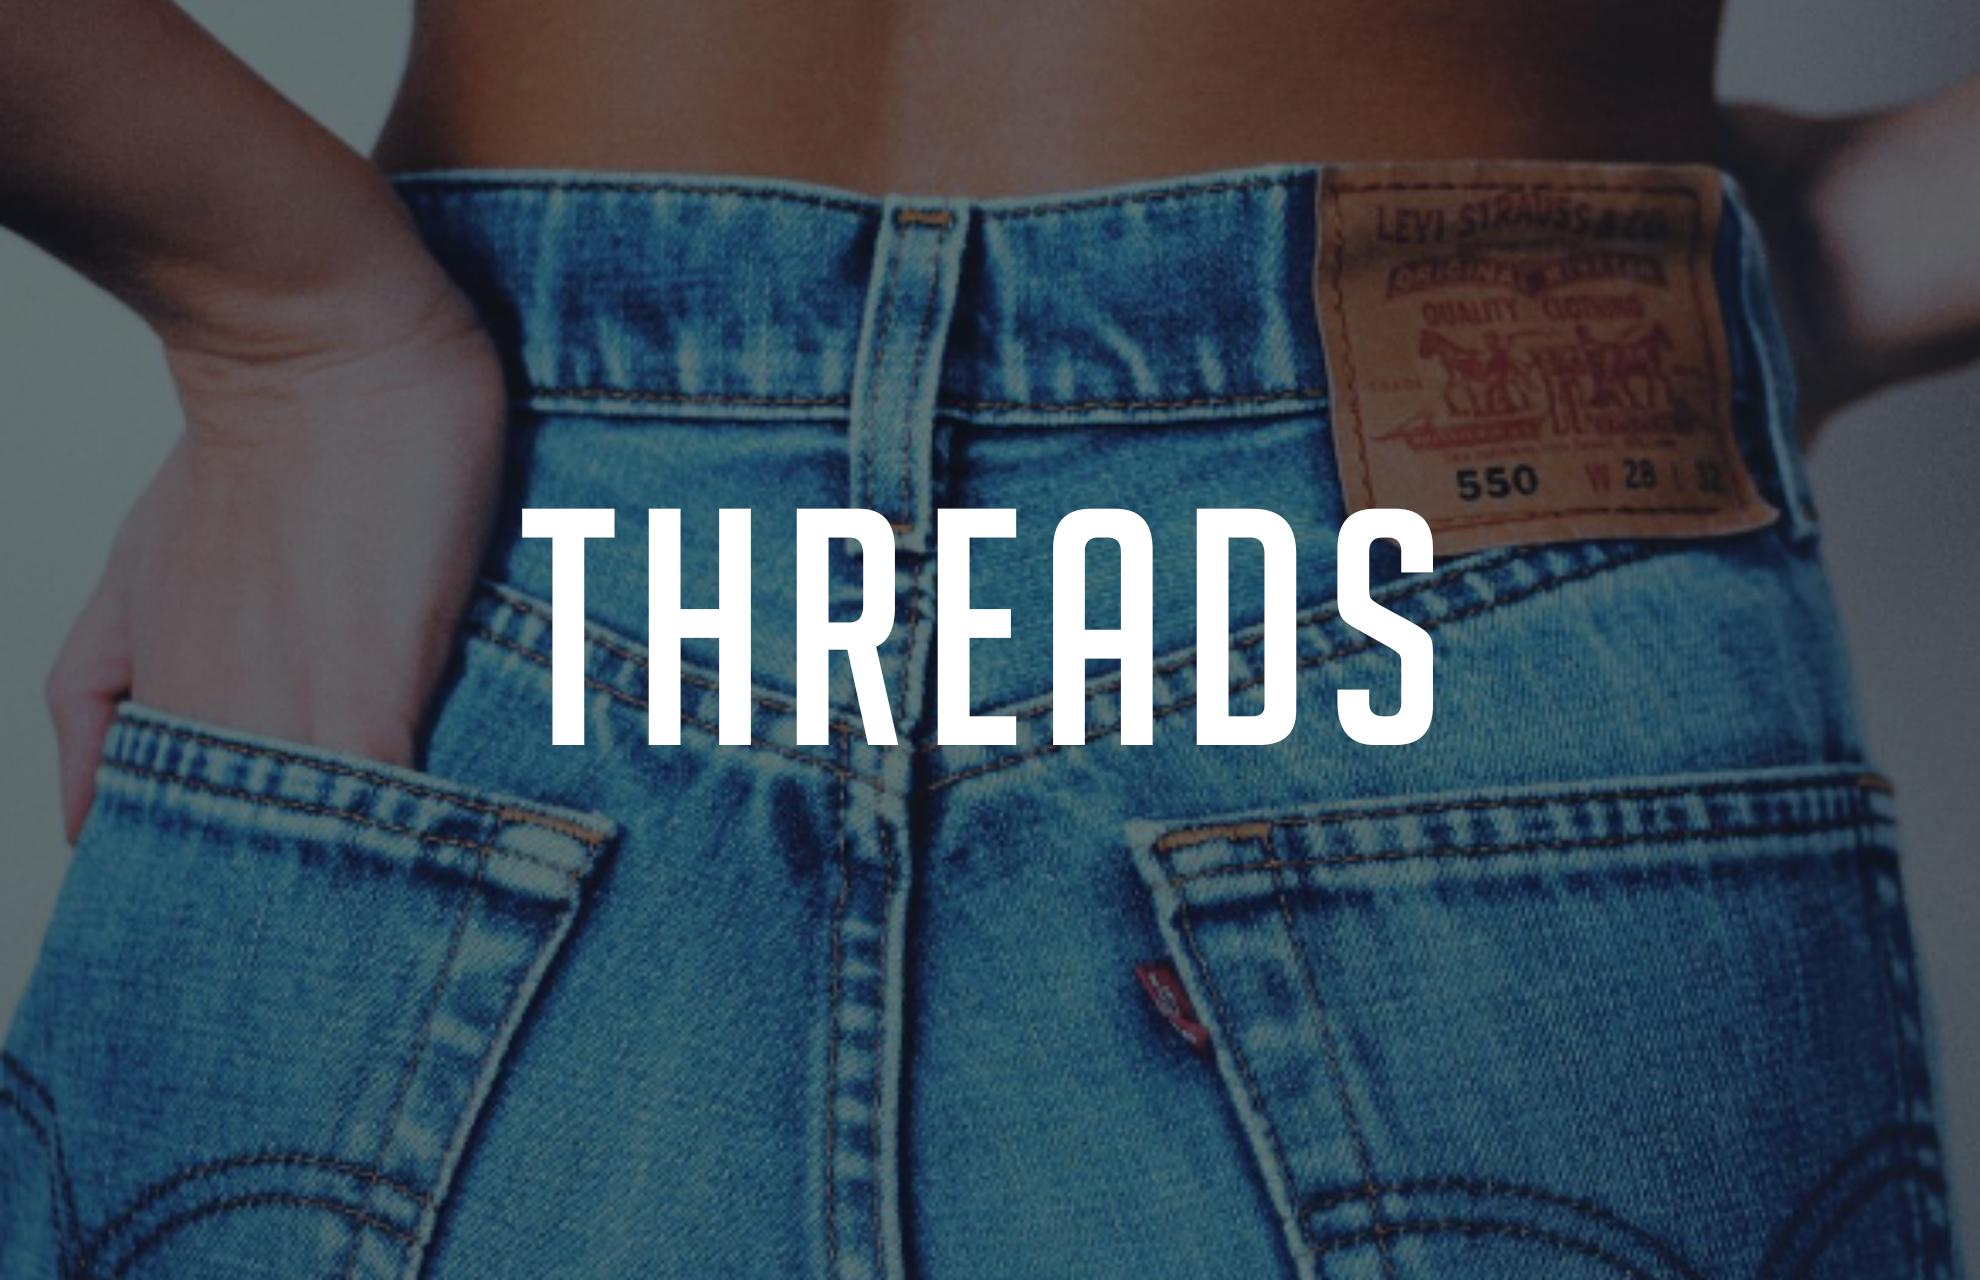 Threads website.jpg